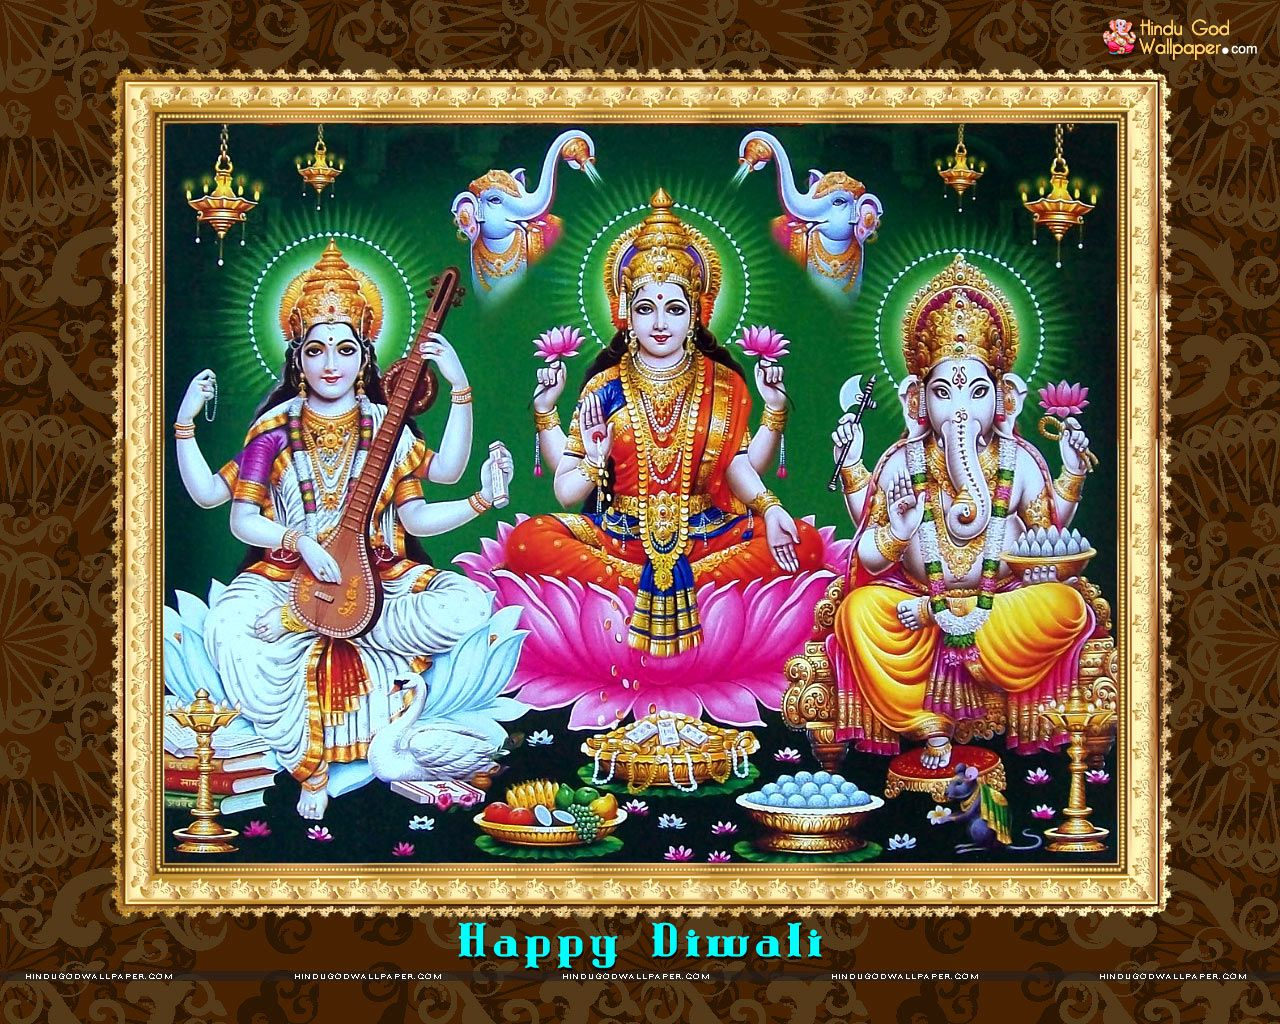 Laxmi Ganesh Saraswati Wallpaper Download Ganesh Wallpaper Wallpaper Downloads Lord Vishnu Wallpapers